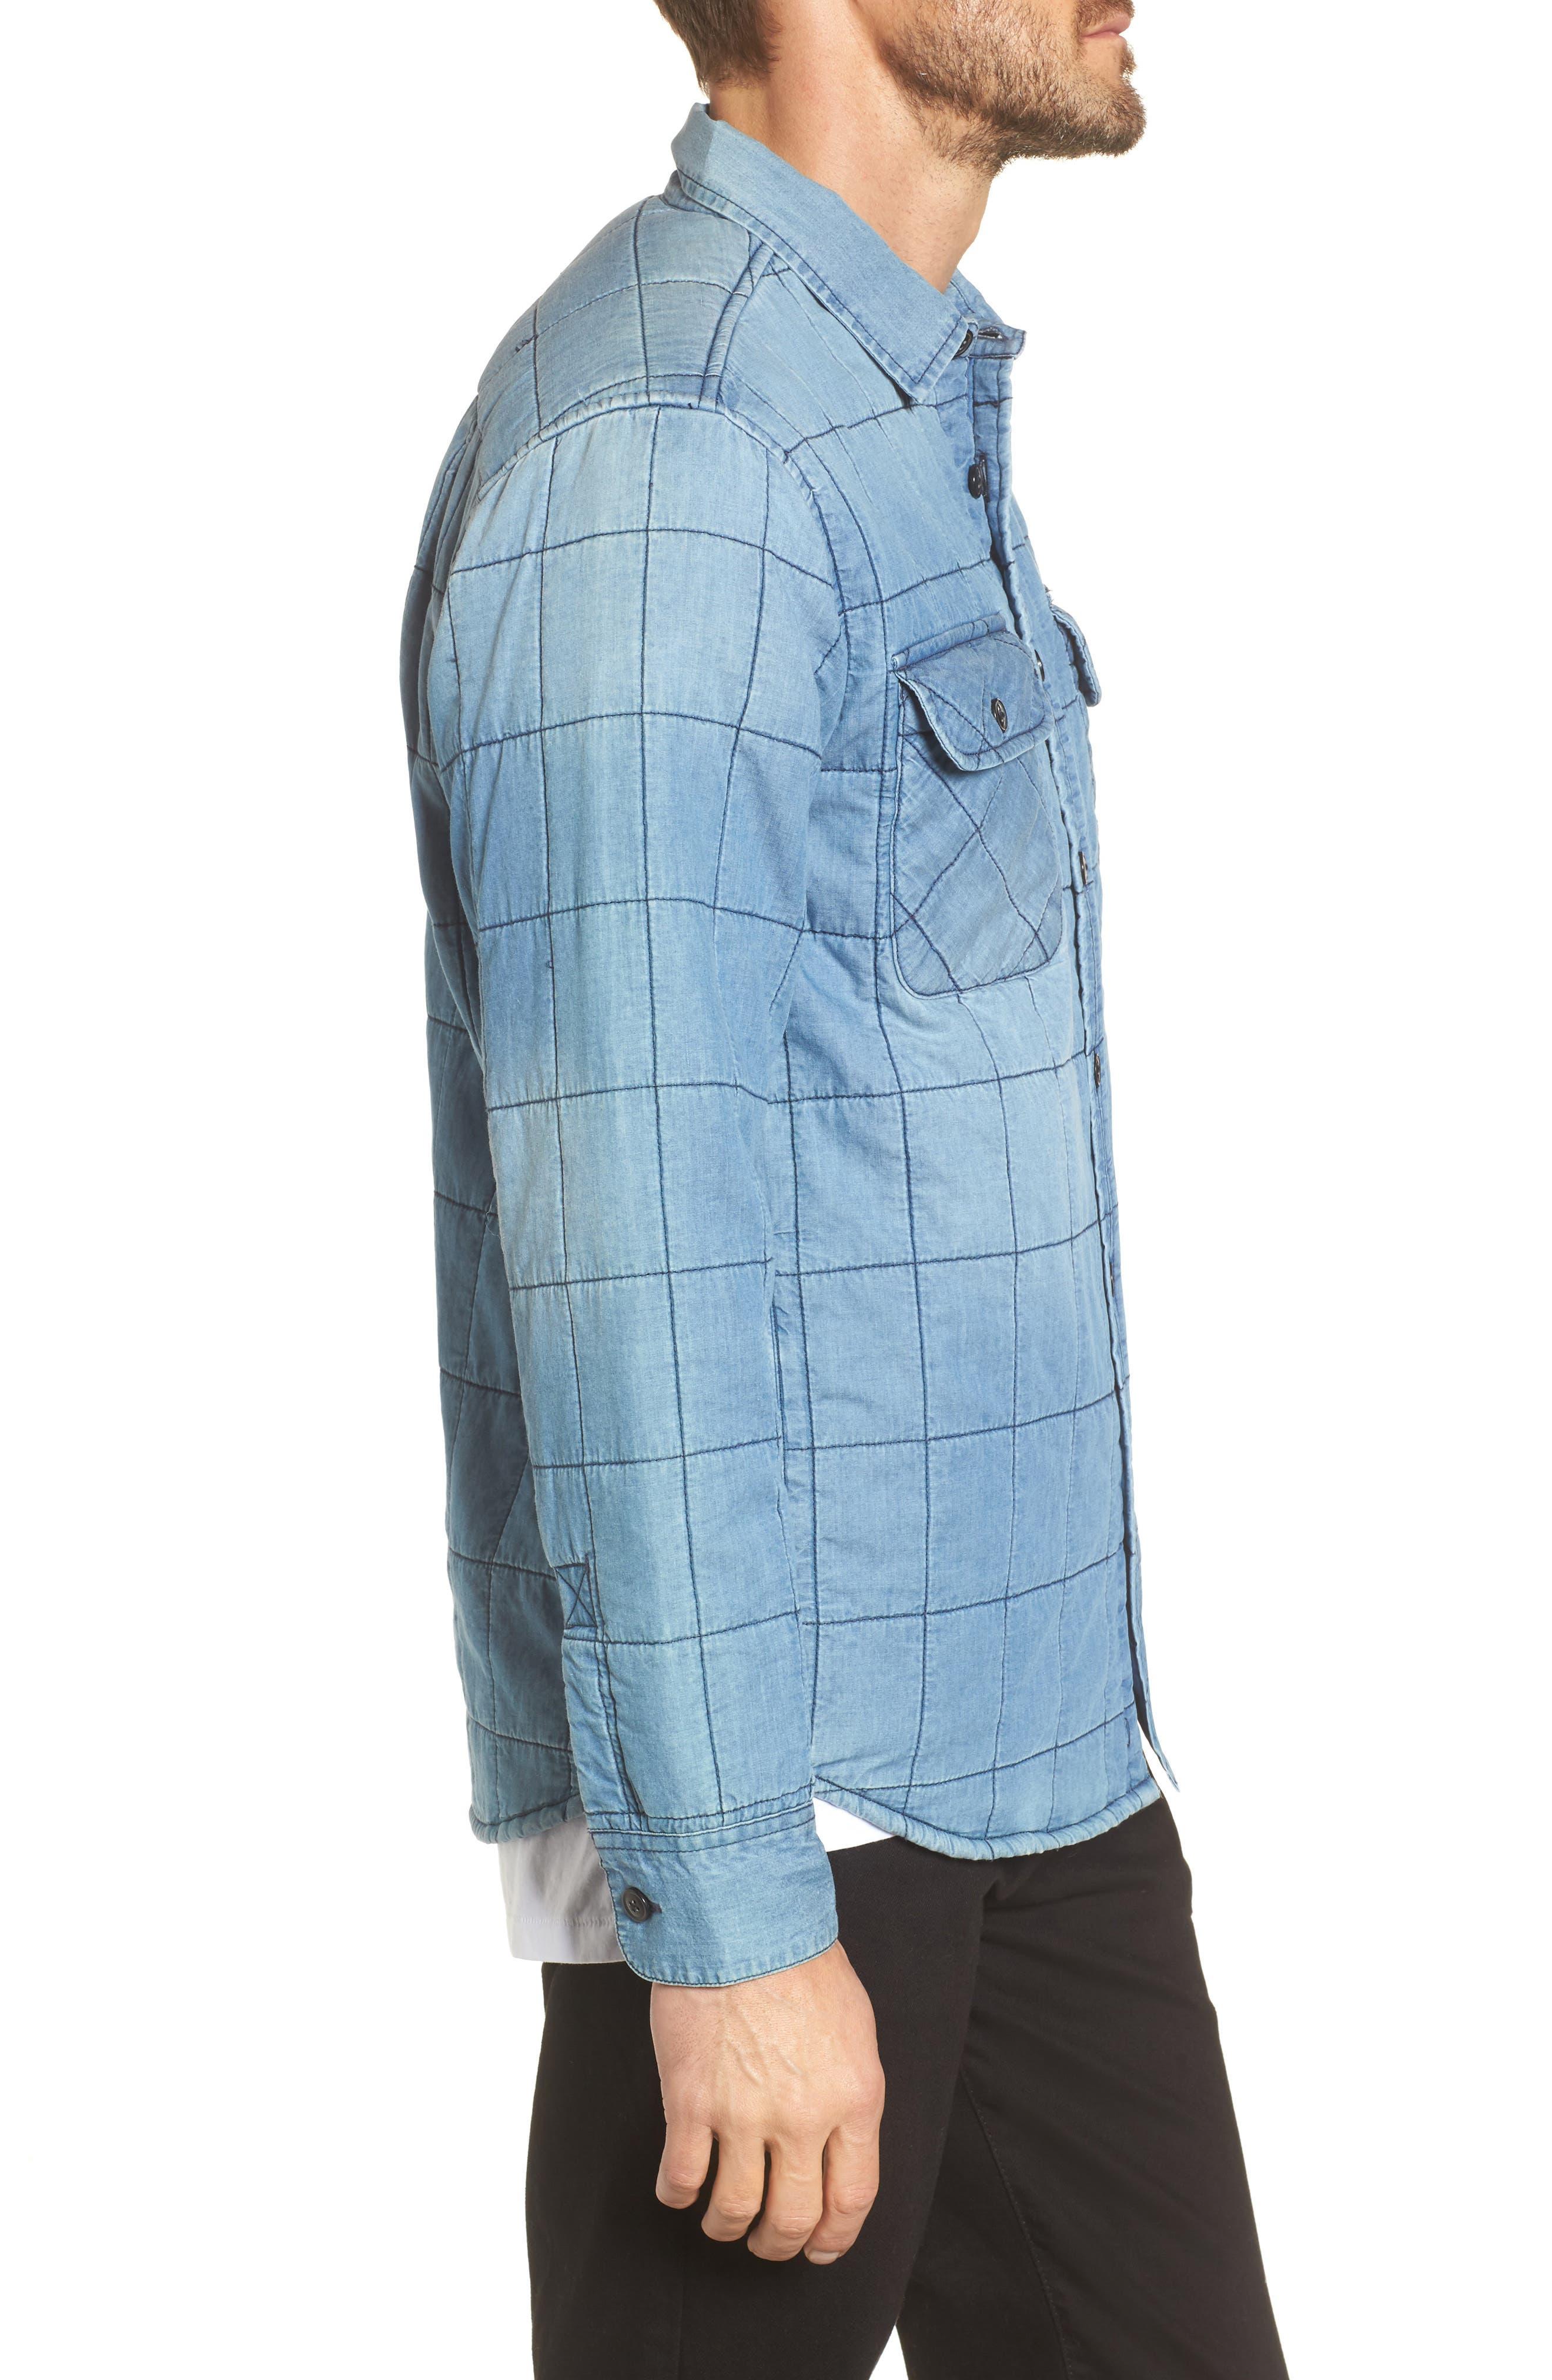 Wrecker Jacket,                             Alternate thumbnail 3, color,                             Vintage Indigo